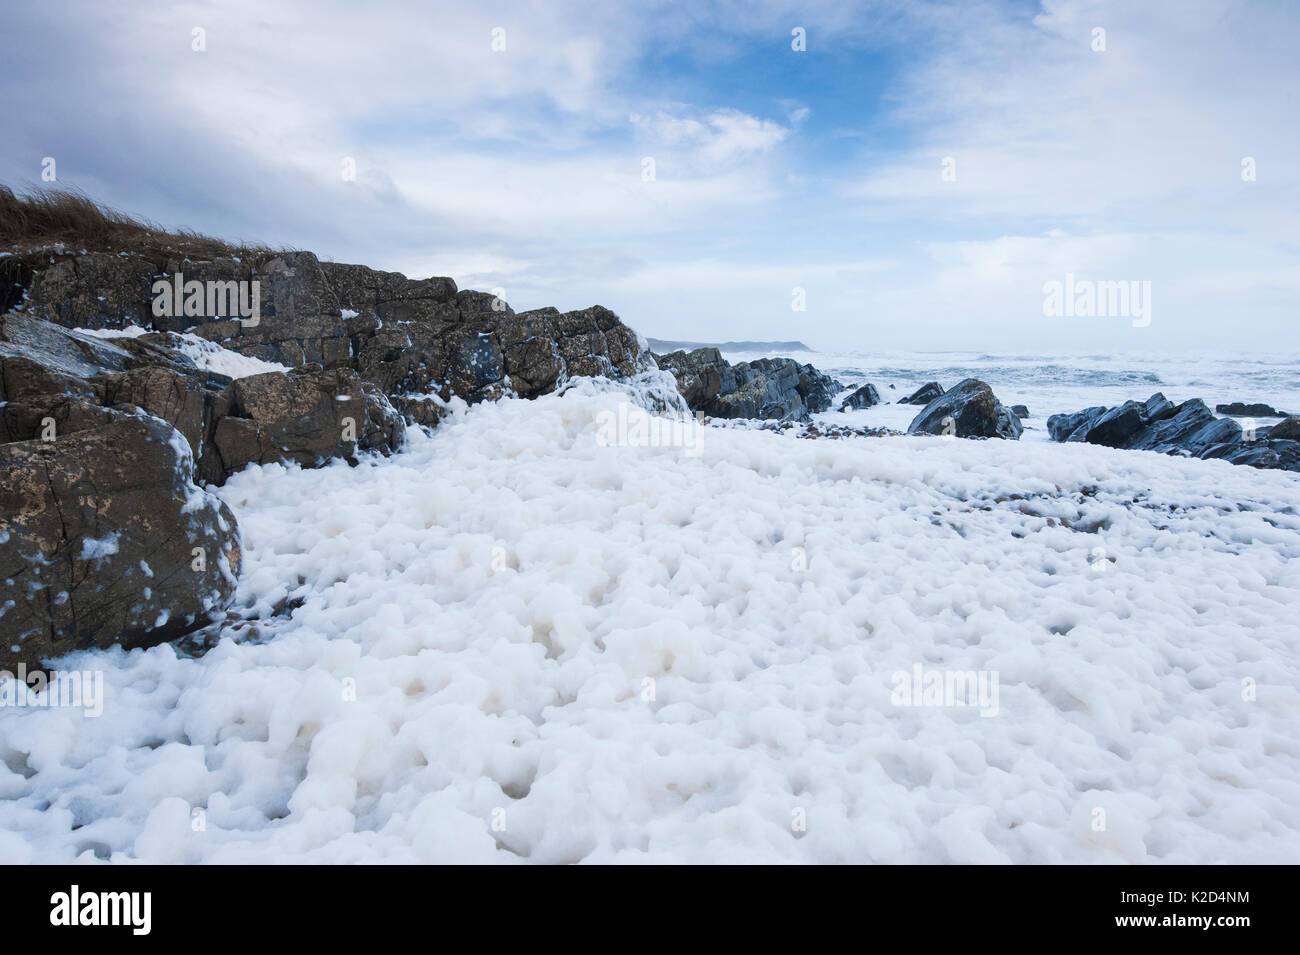 Spume on beach at Saligo Bay, Islay, Scotland, February 2014. - Stock Image